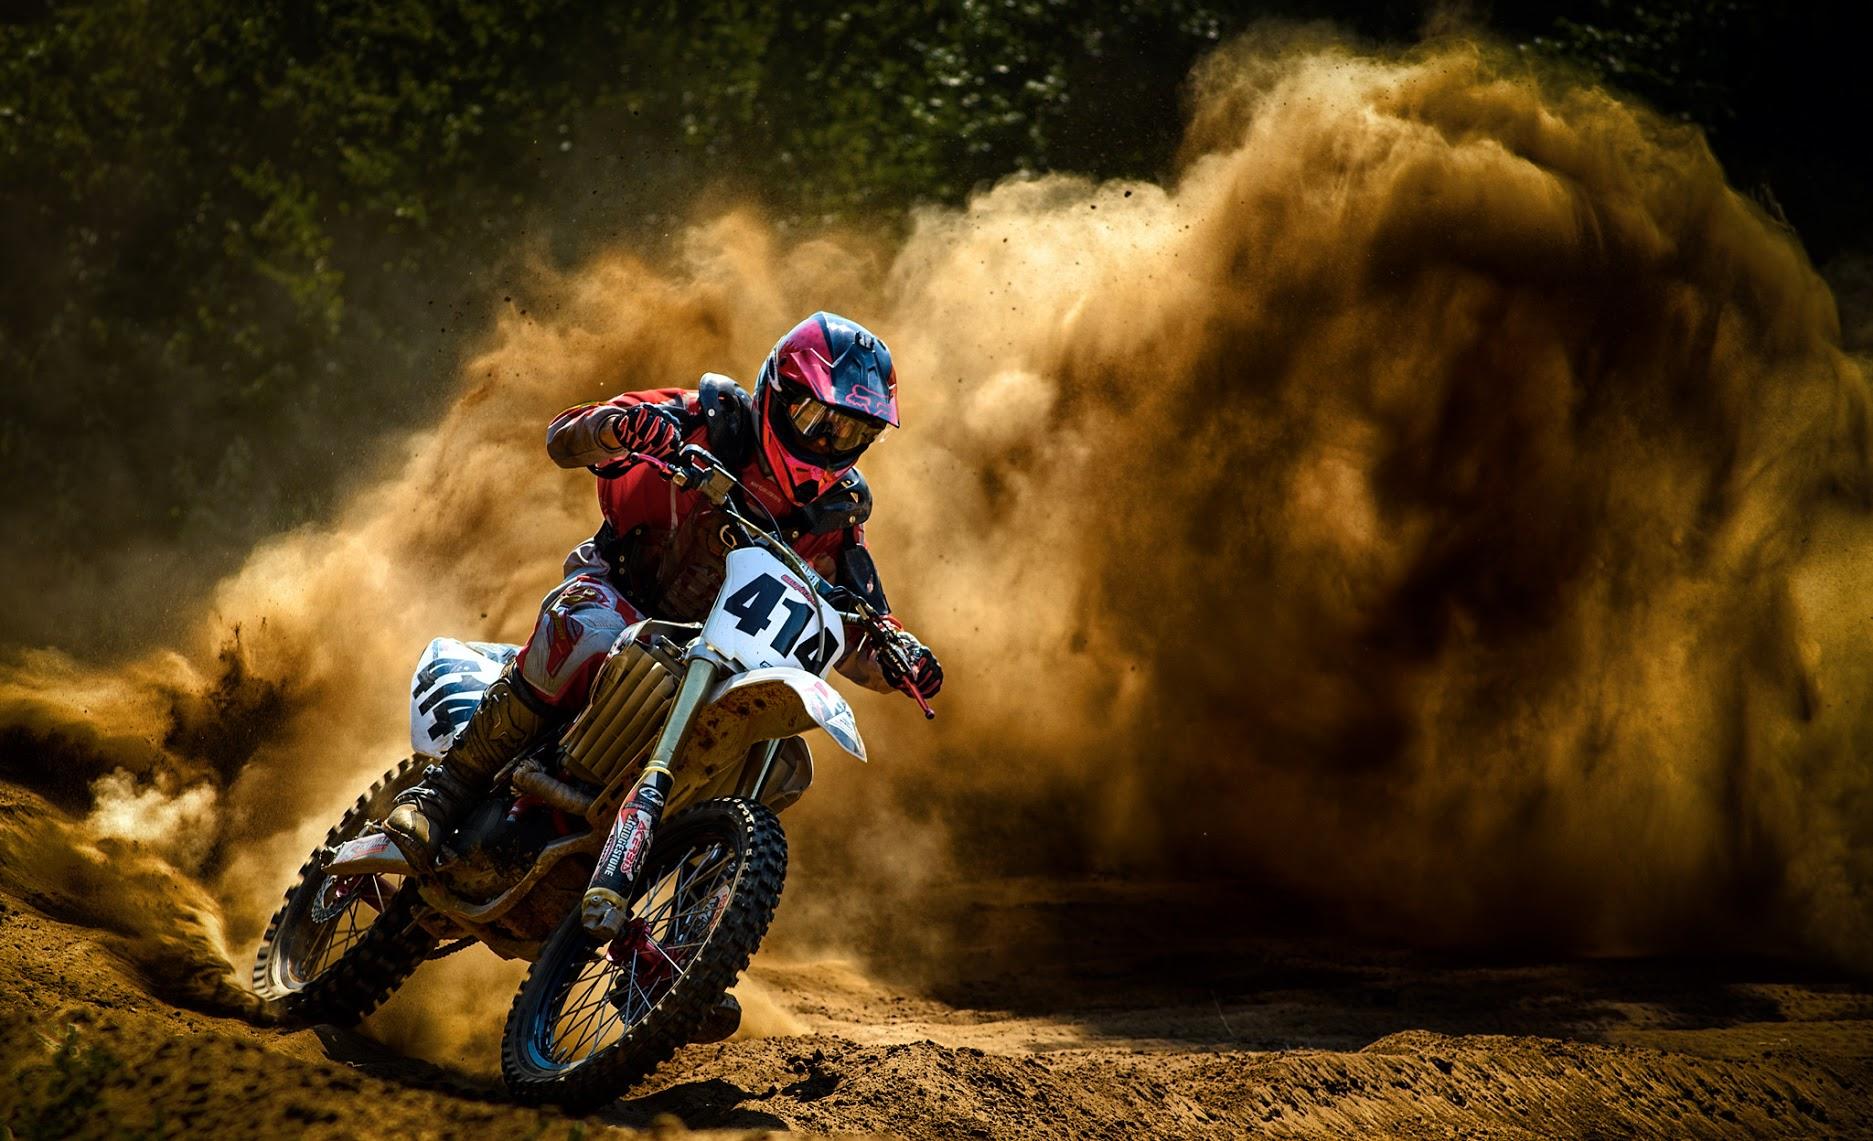 Top 10 Health Benefits of Dirt Biking - DirtXtreme